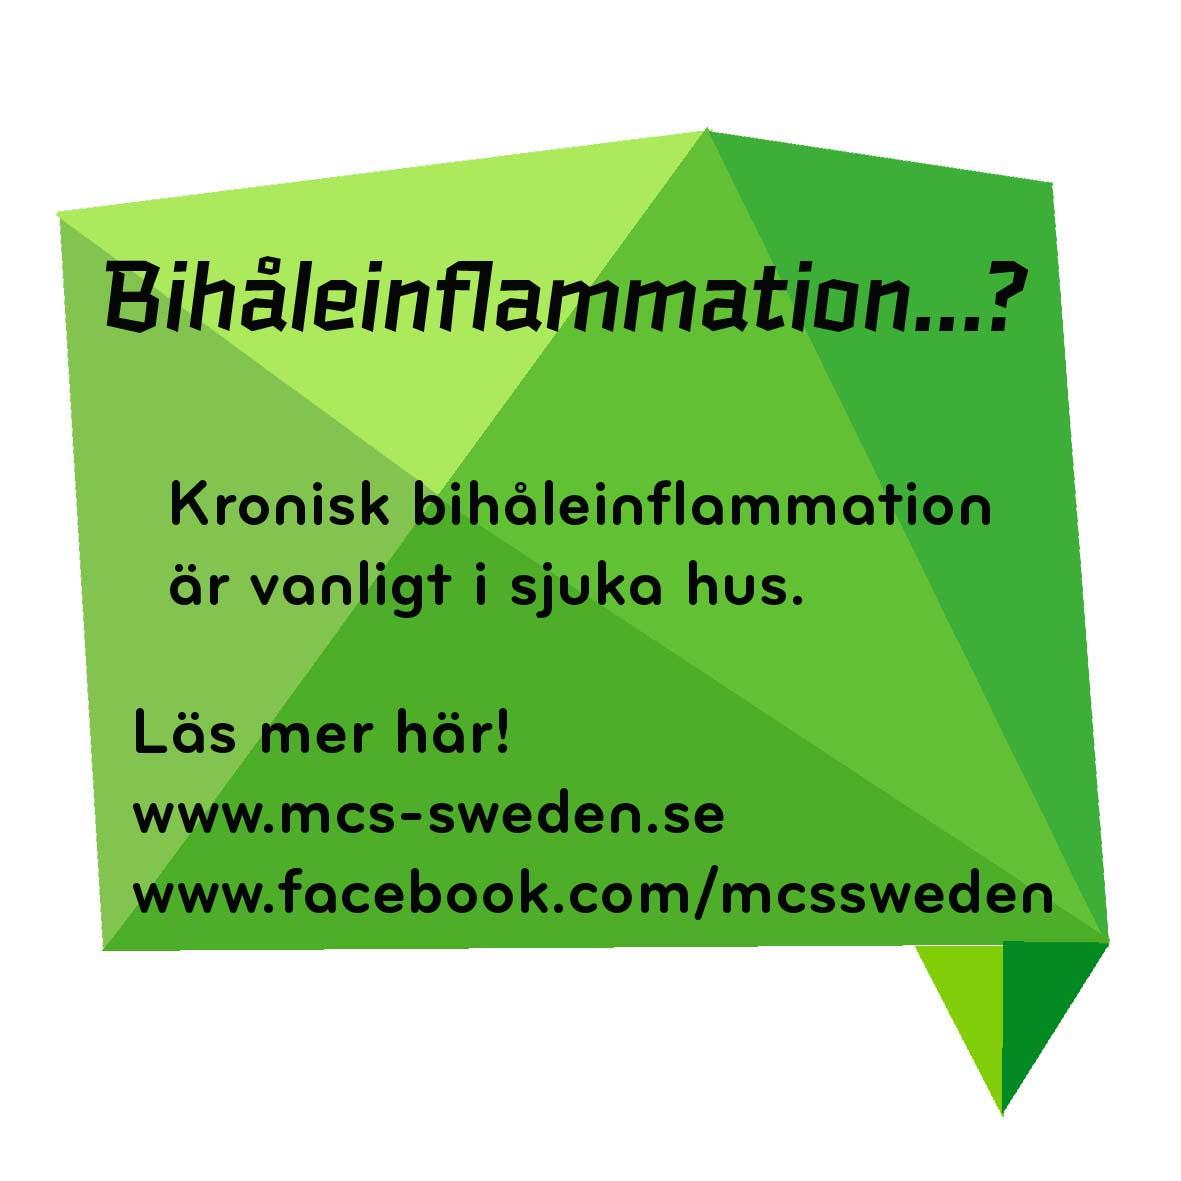 Bihåleinflammation